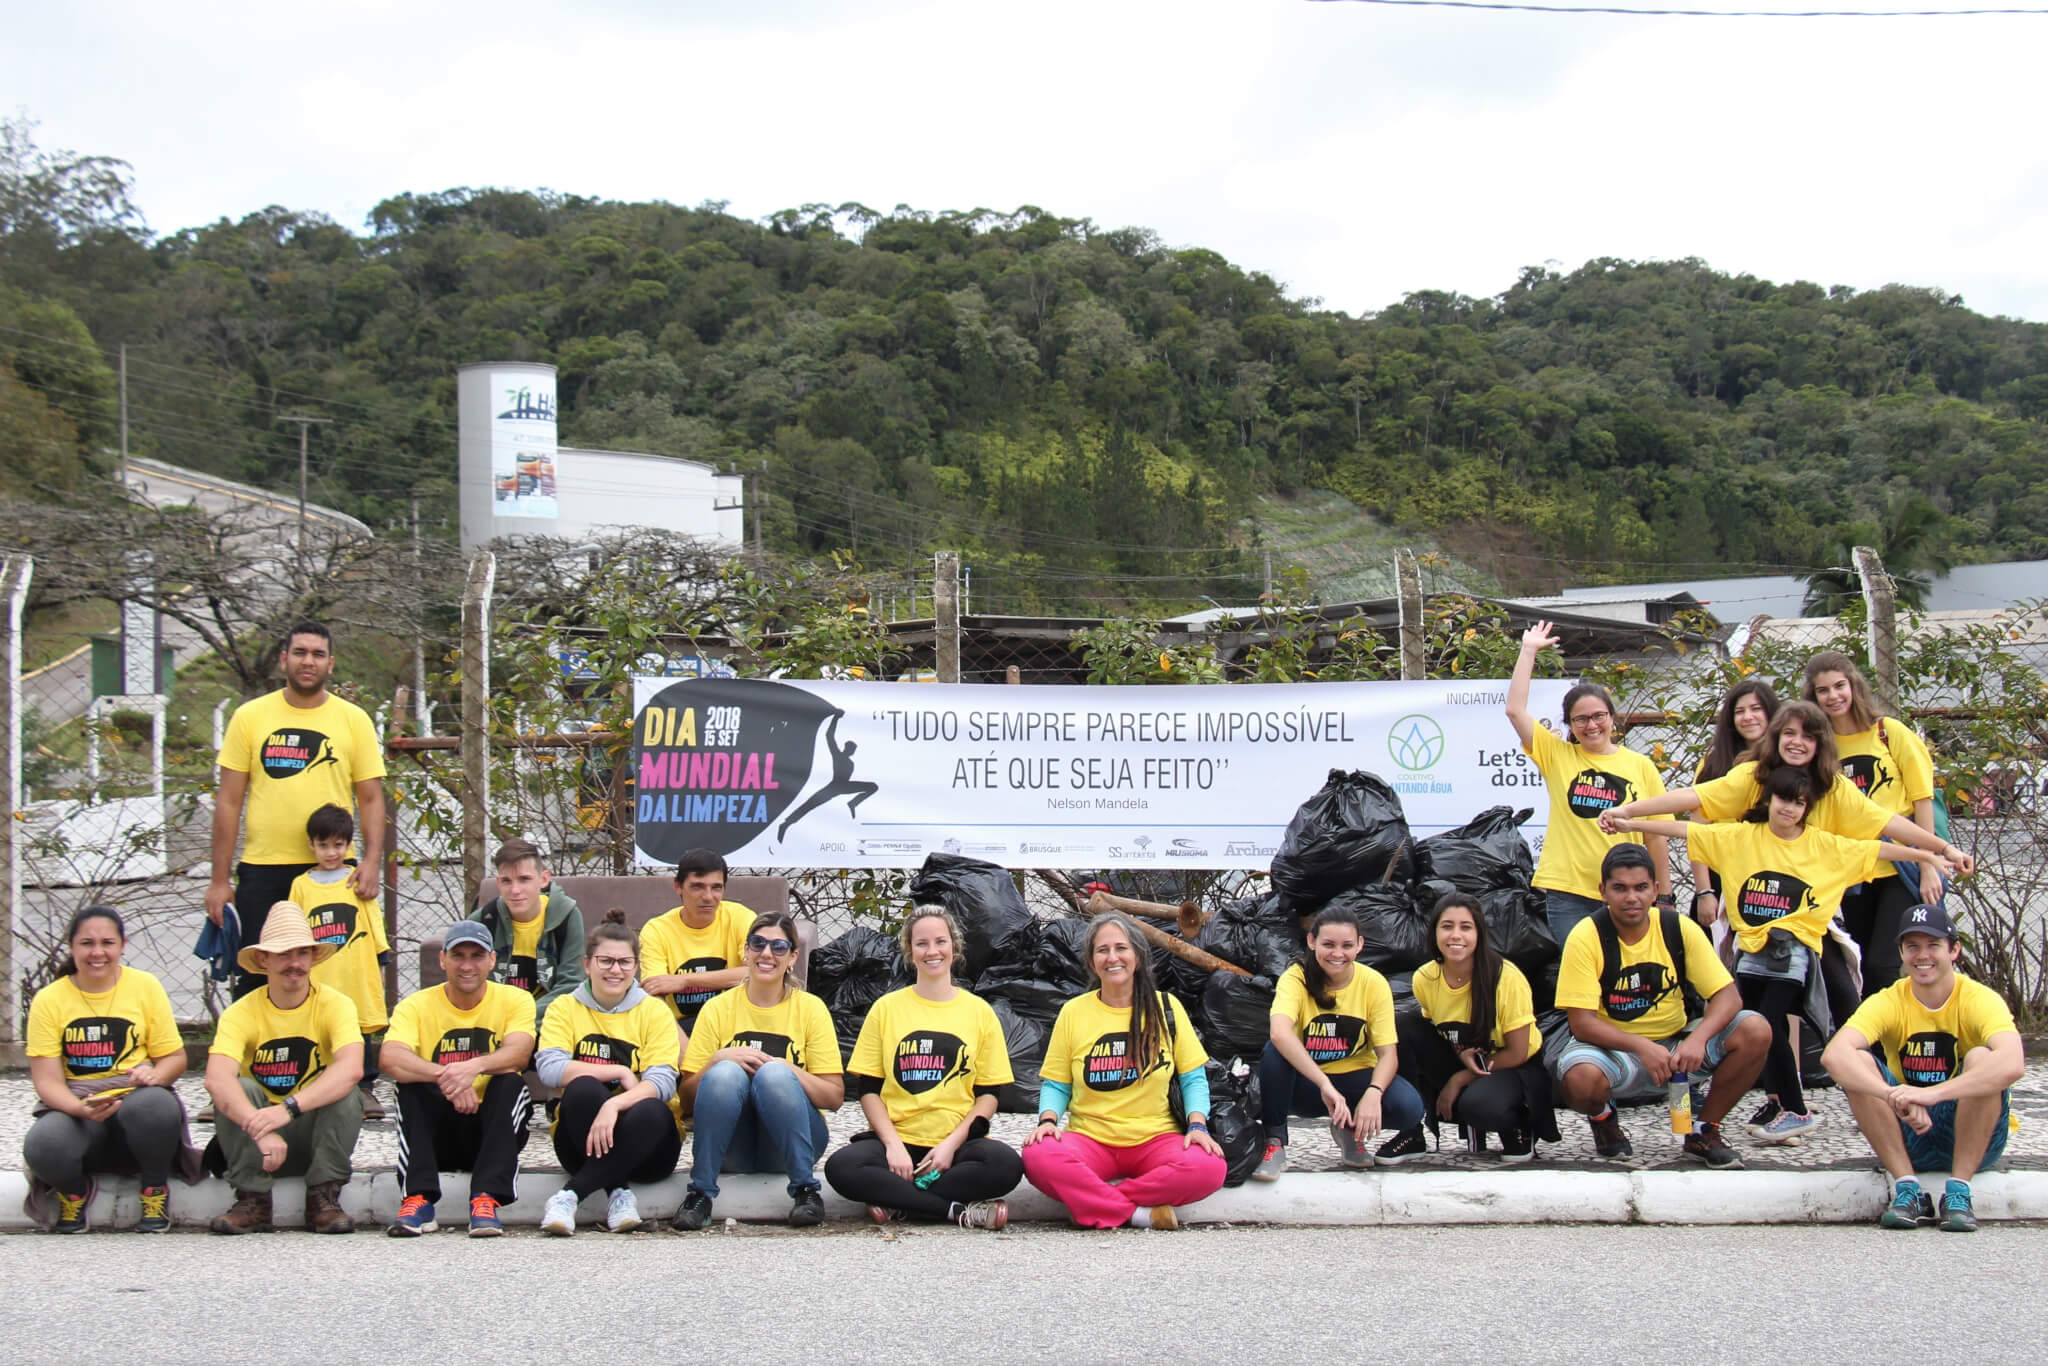 Alunos da UNIFEBE participam do Dia Mundial da Limpeza